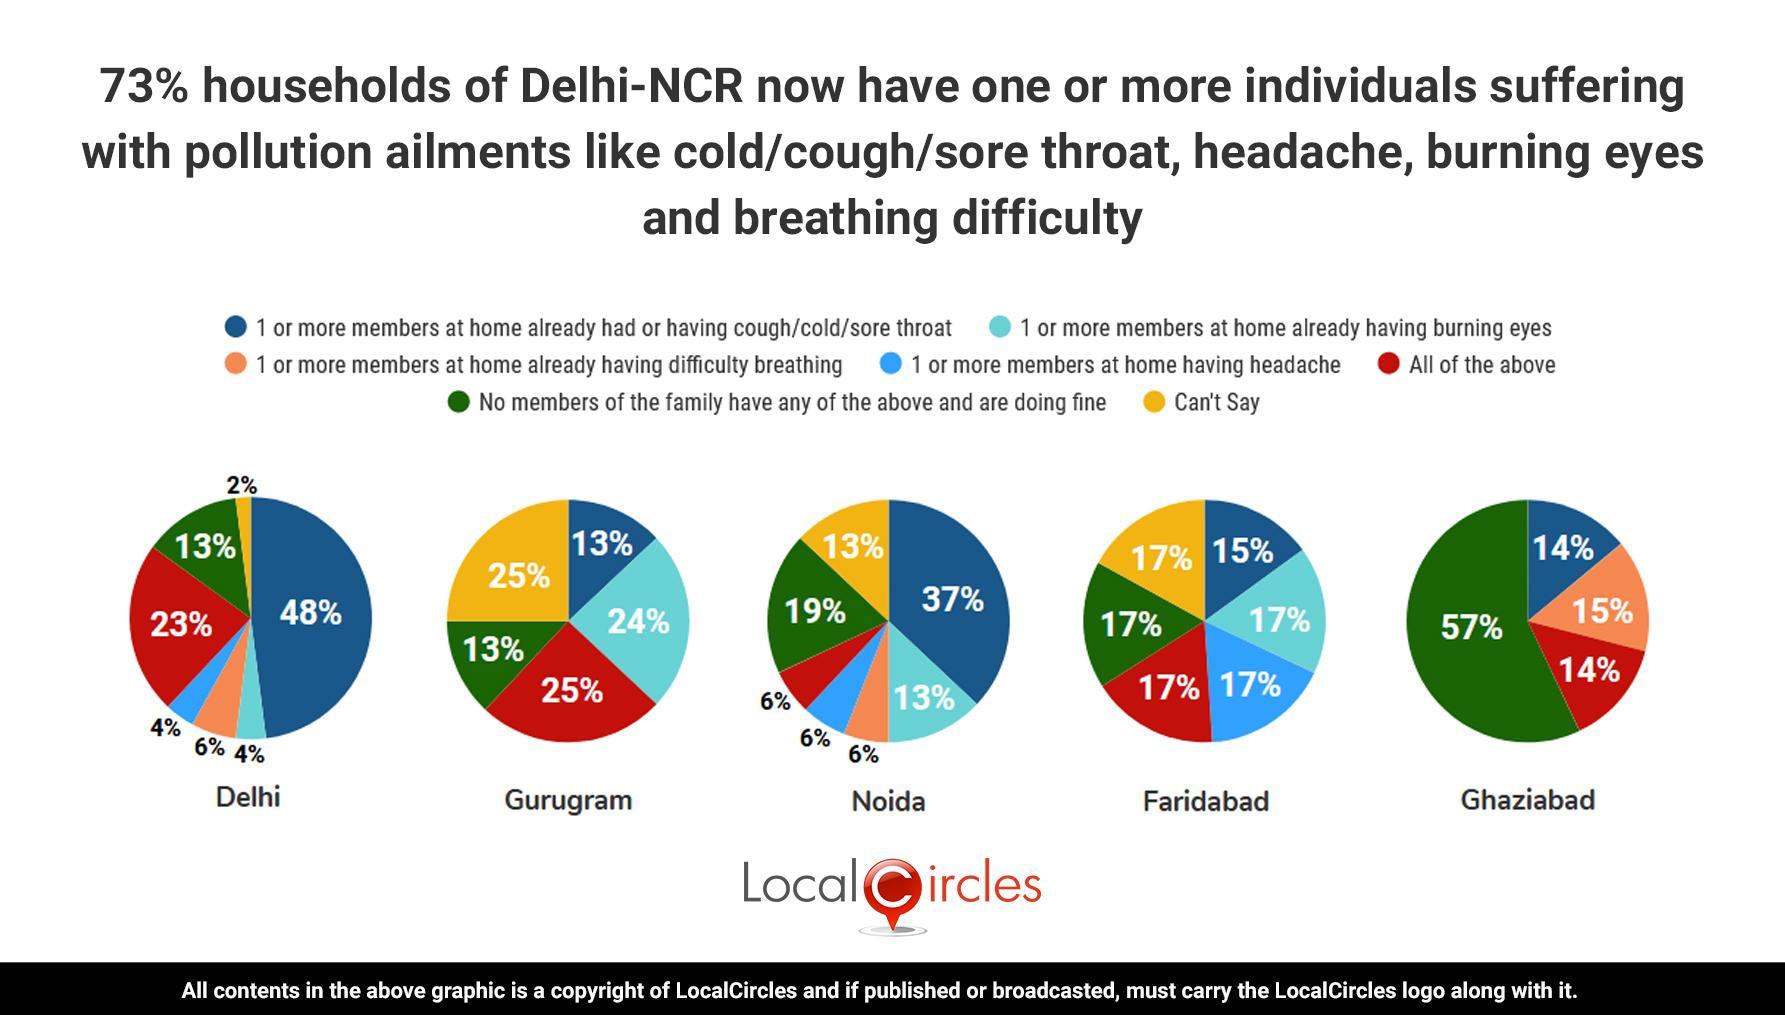 via_LocalCircles_Delhi_NCR_AQI_Polls_-_Summary_-_1___20201111083509___.jpg